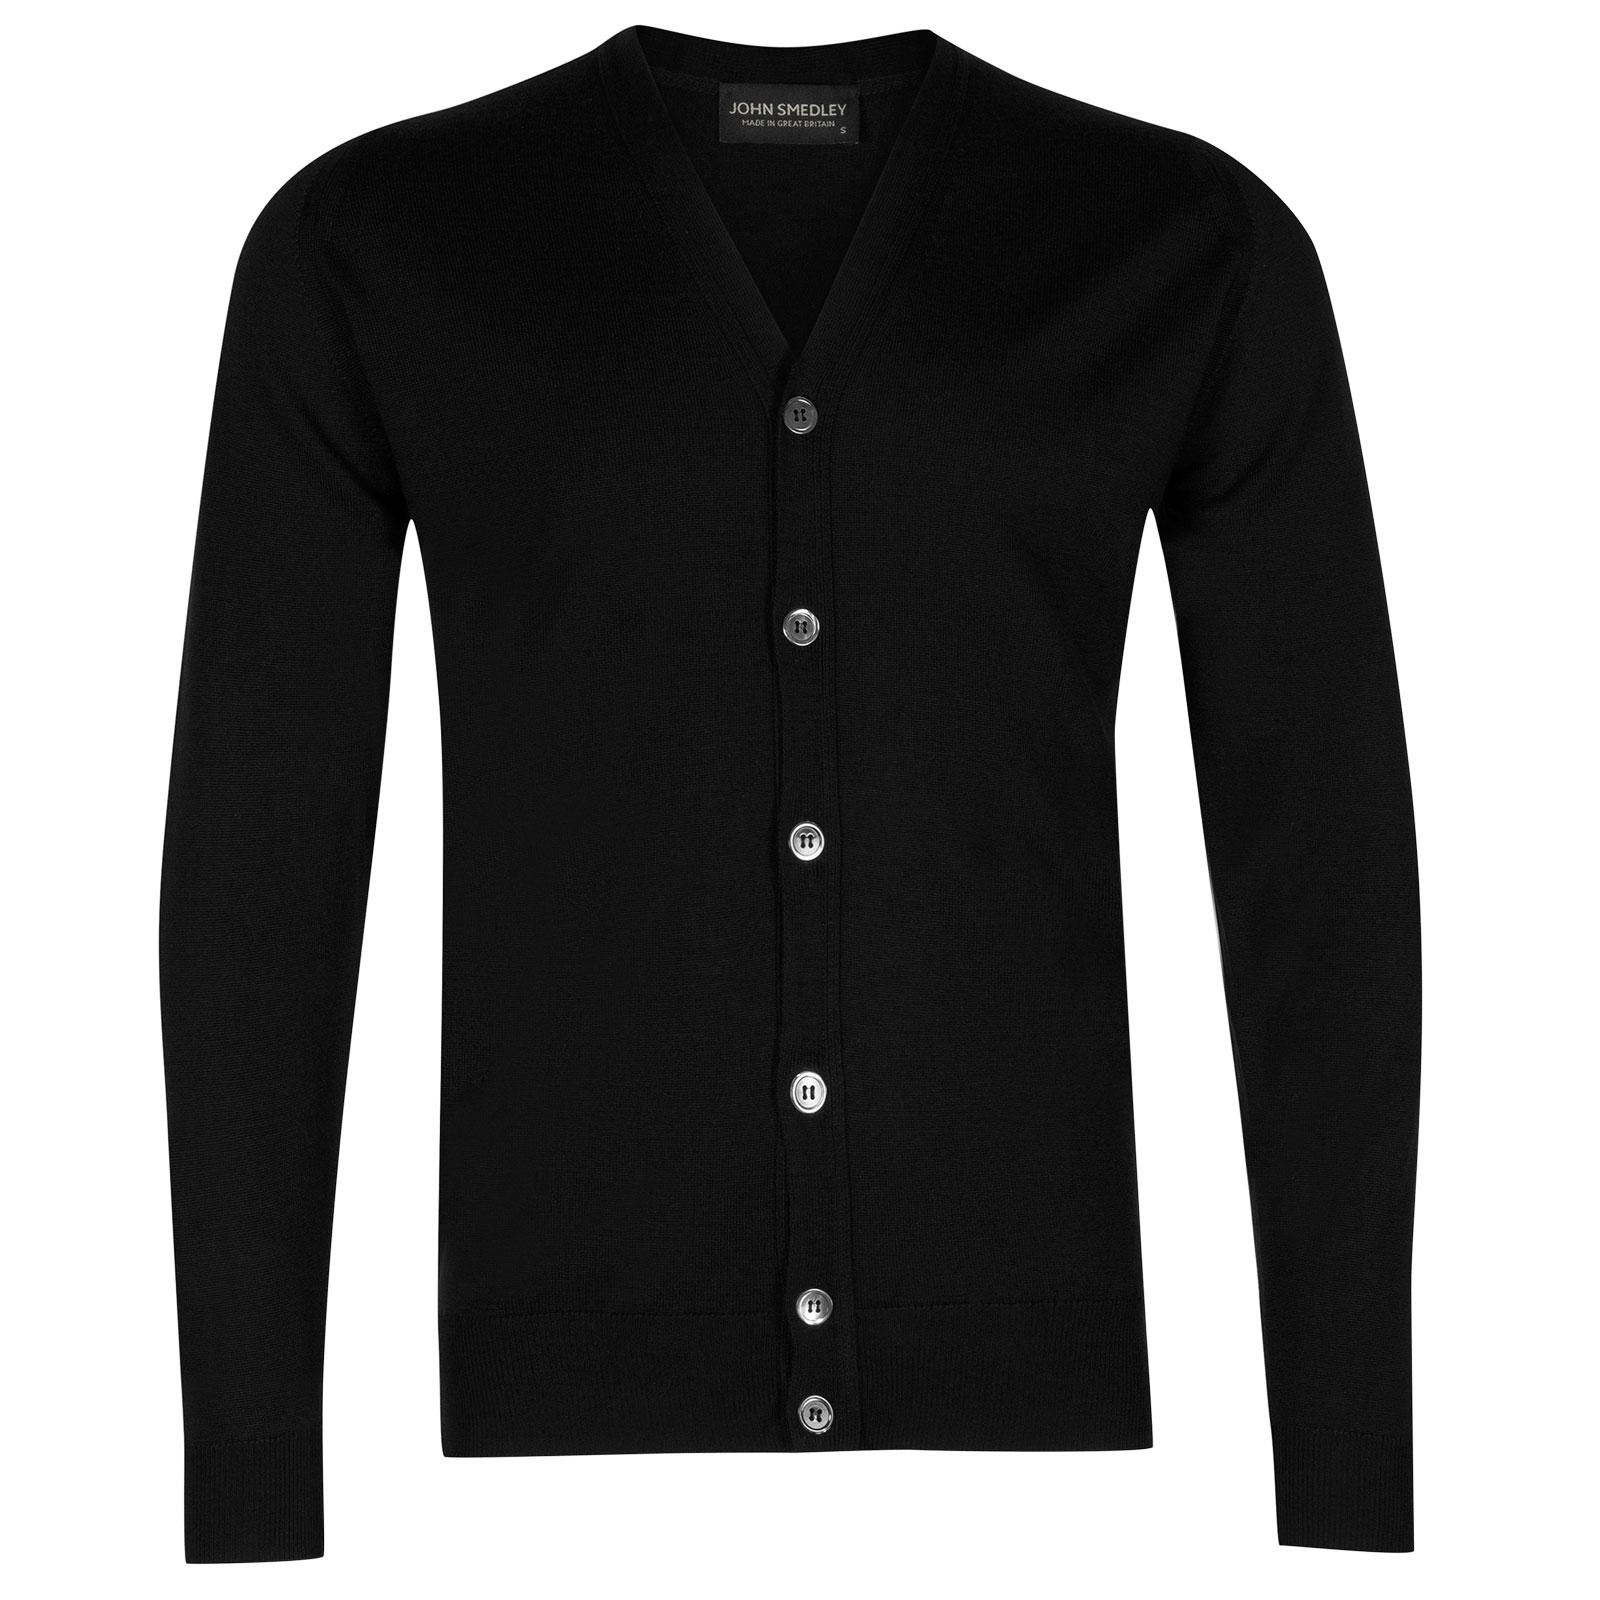 John Smedley burley Merino Wool Cardigan in Black-L